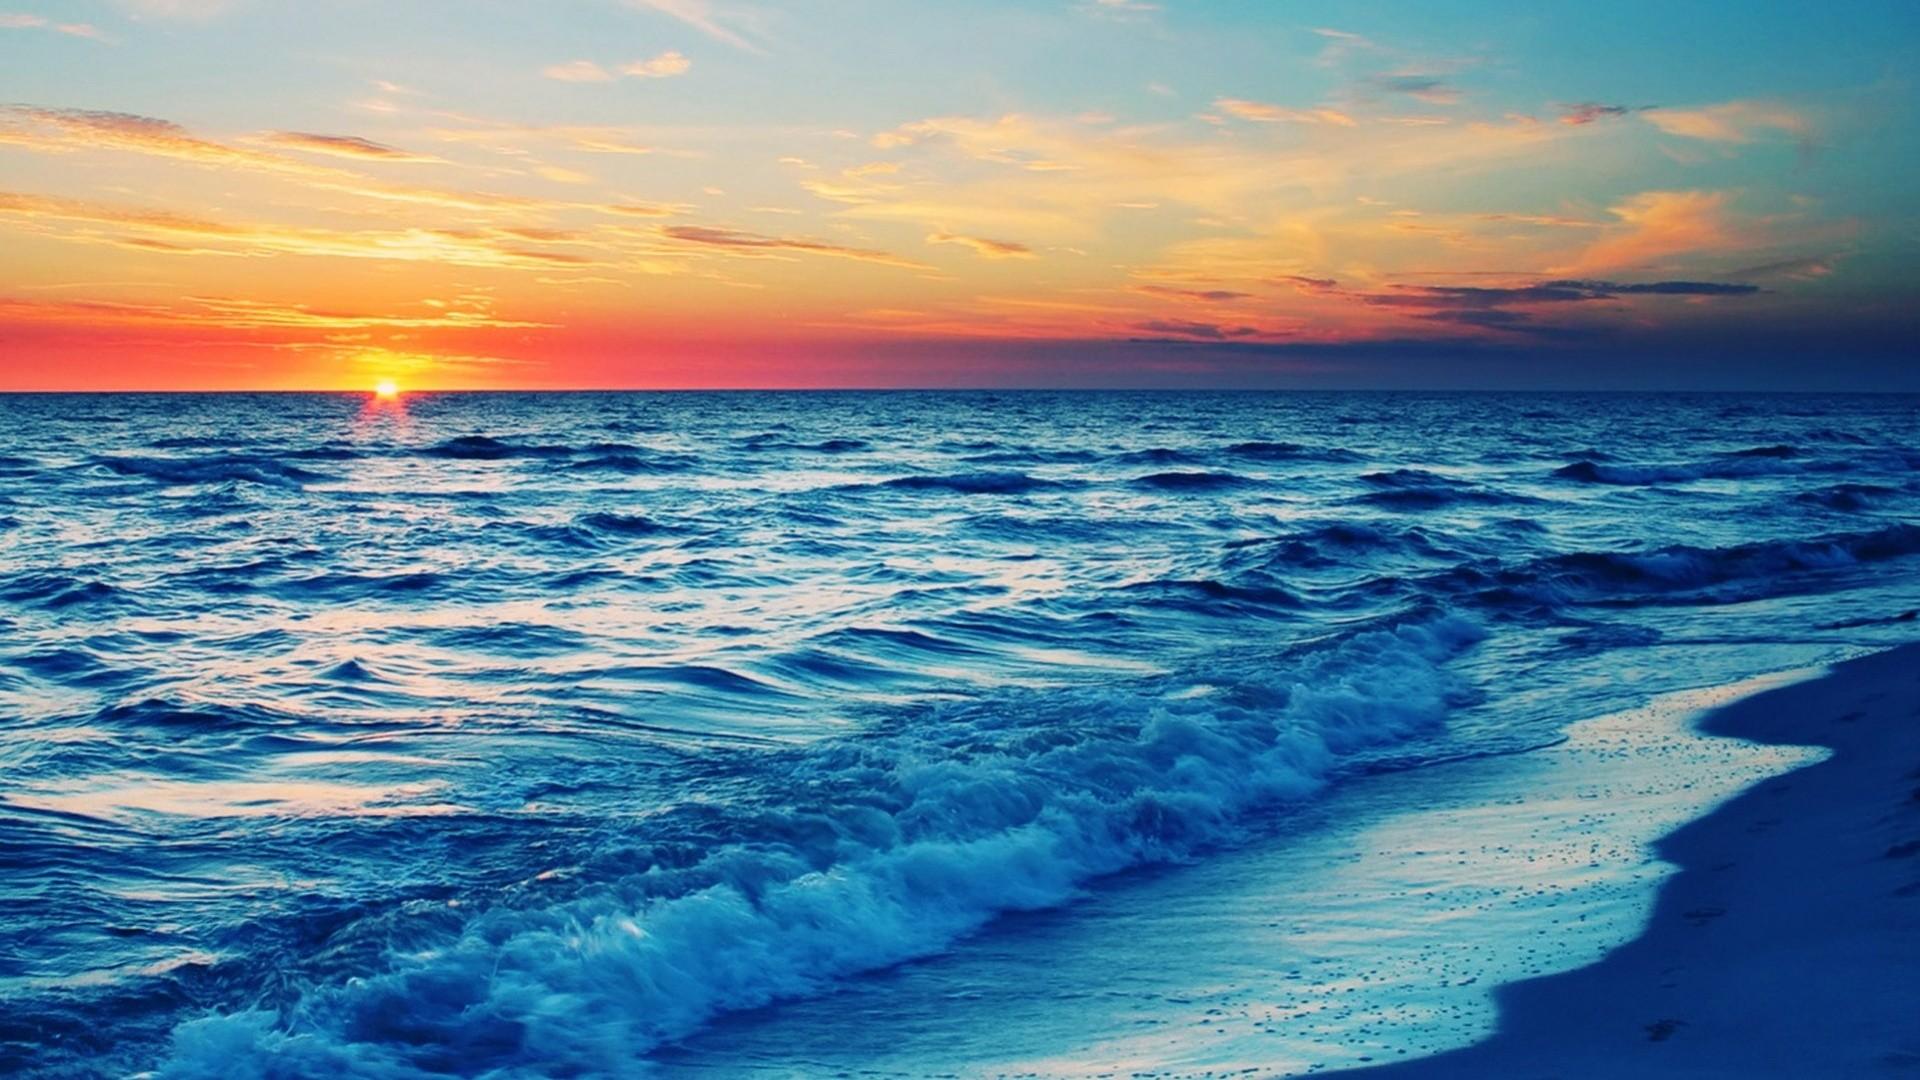 <b>HD Beach Wallpapers 1920×1080</b> – WallpaperSafari